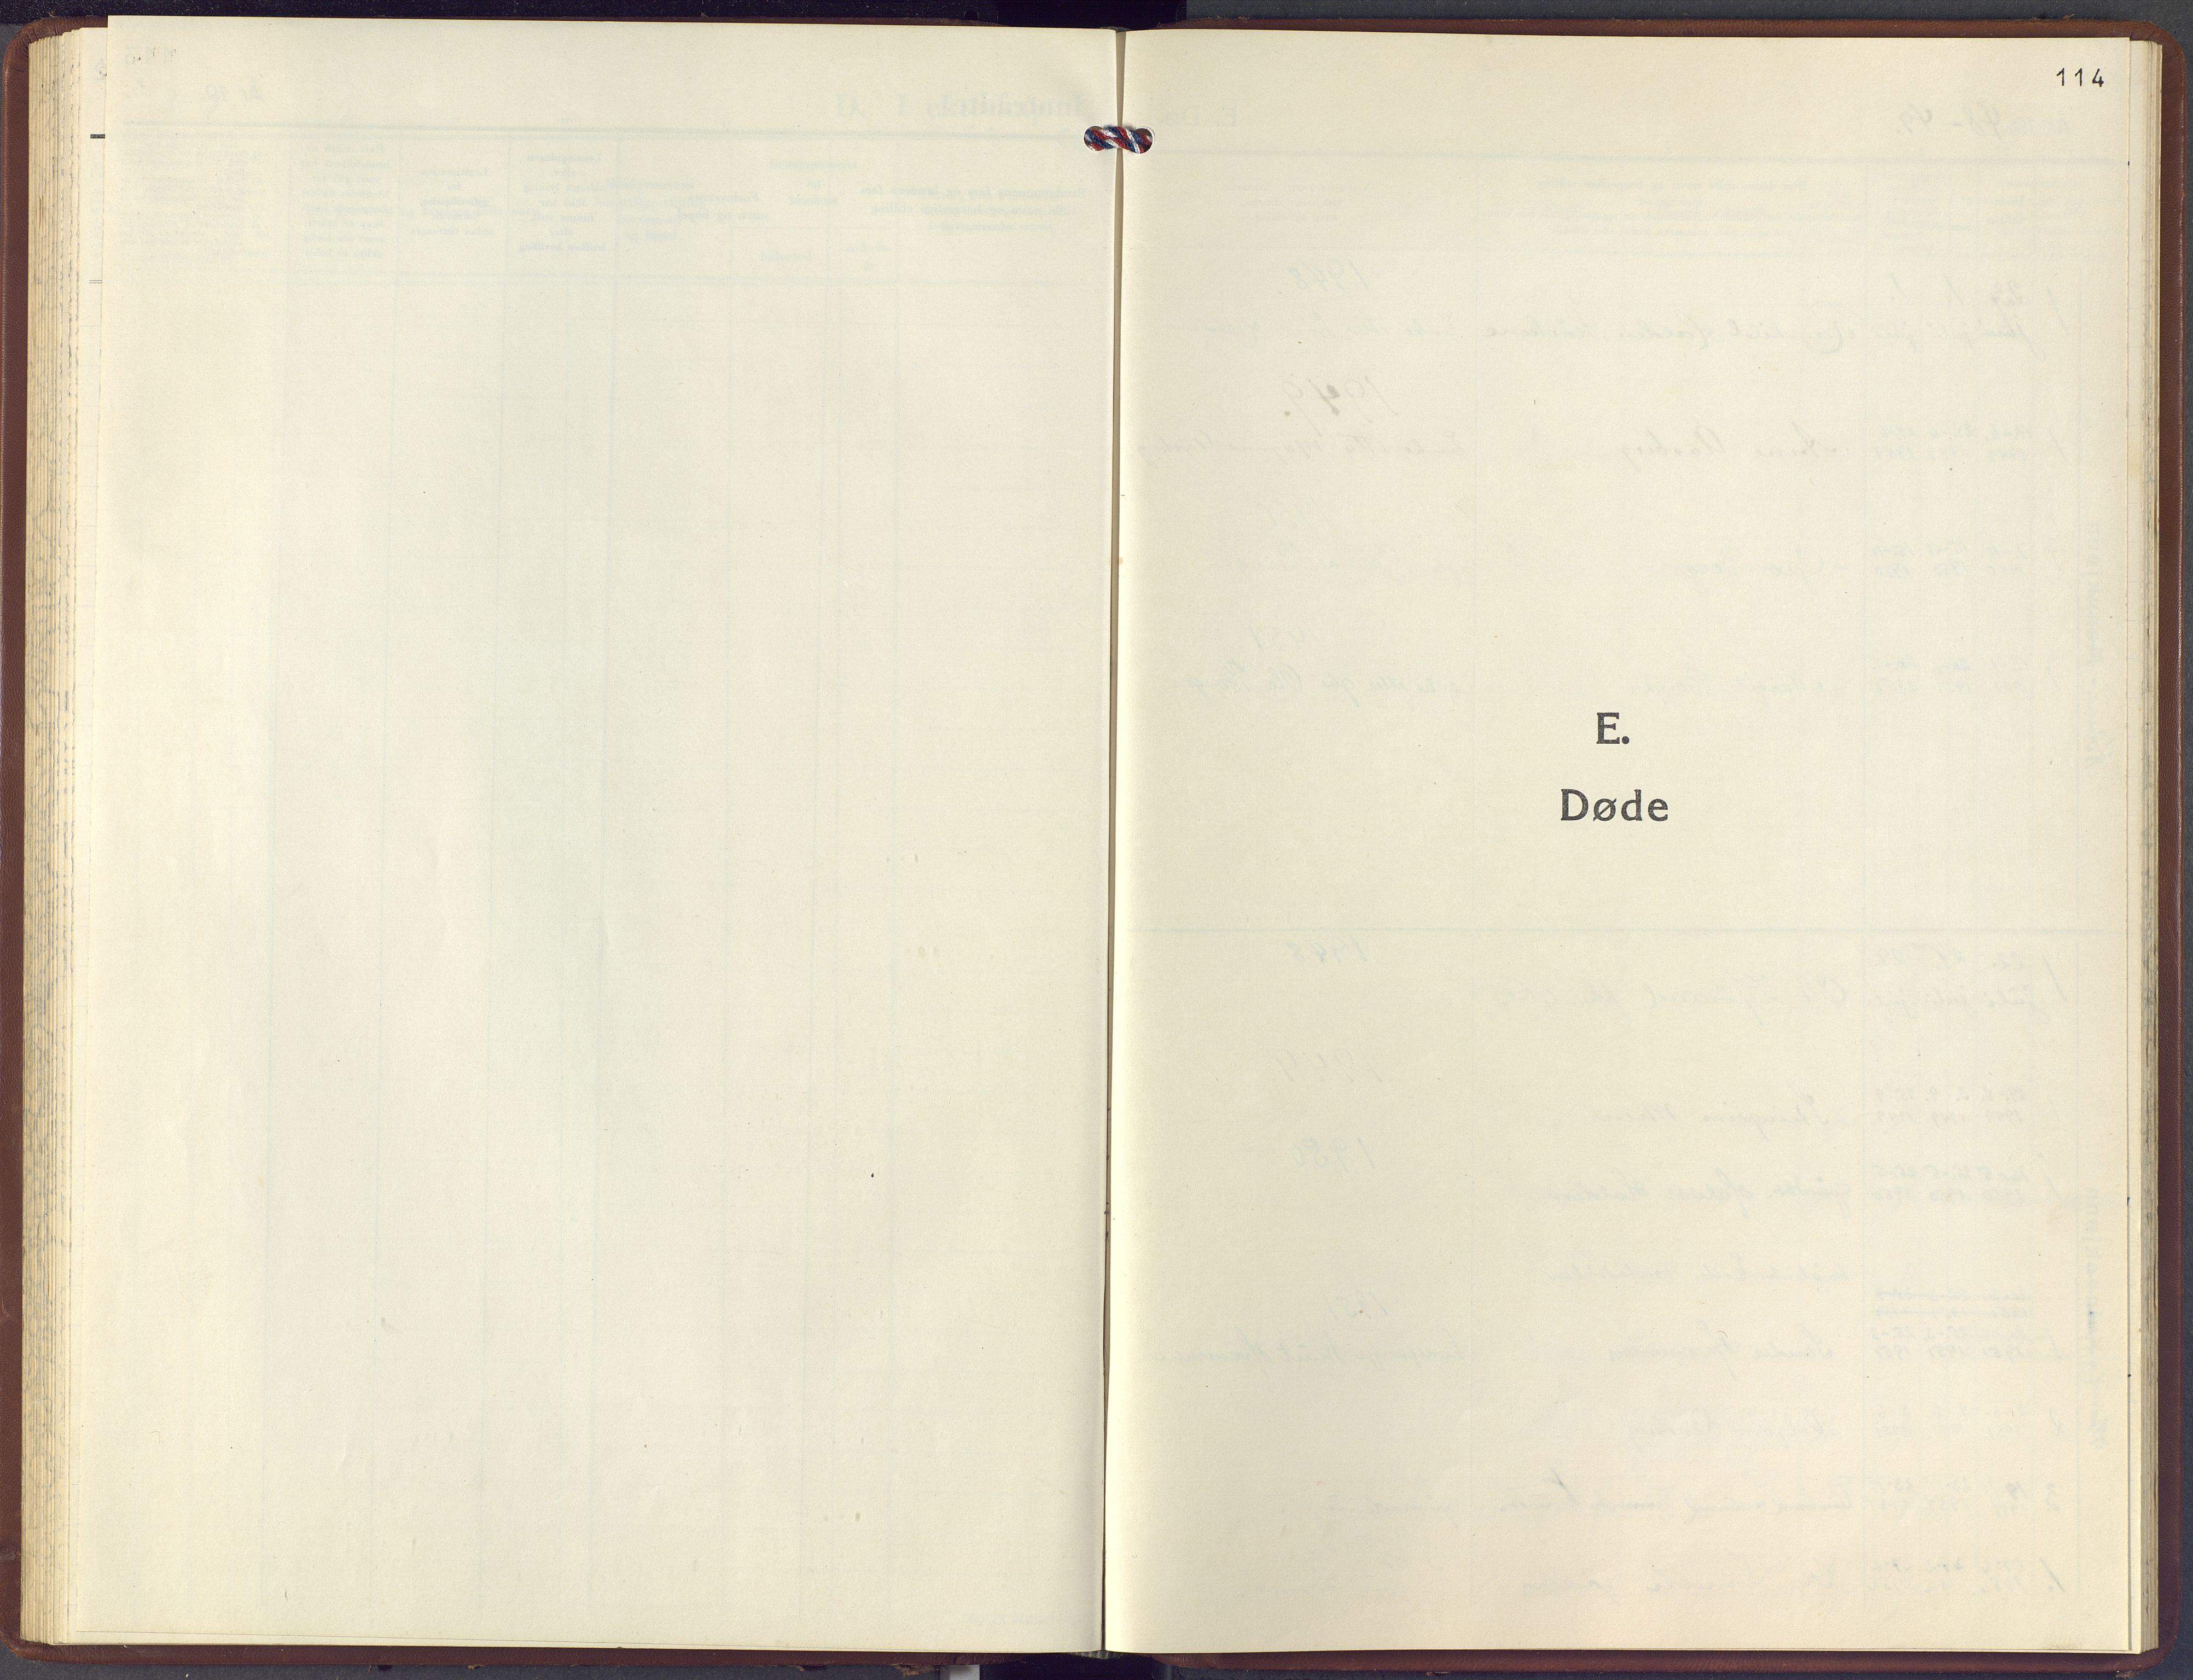 SAKO, Hol kirkebøker, F/Fb/L0001: Ministerialbok nr. II 1, 1948-1978, s. 114